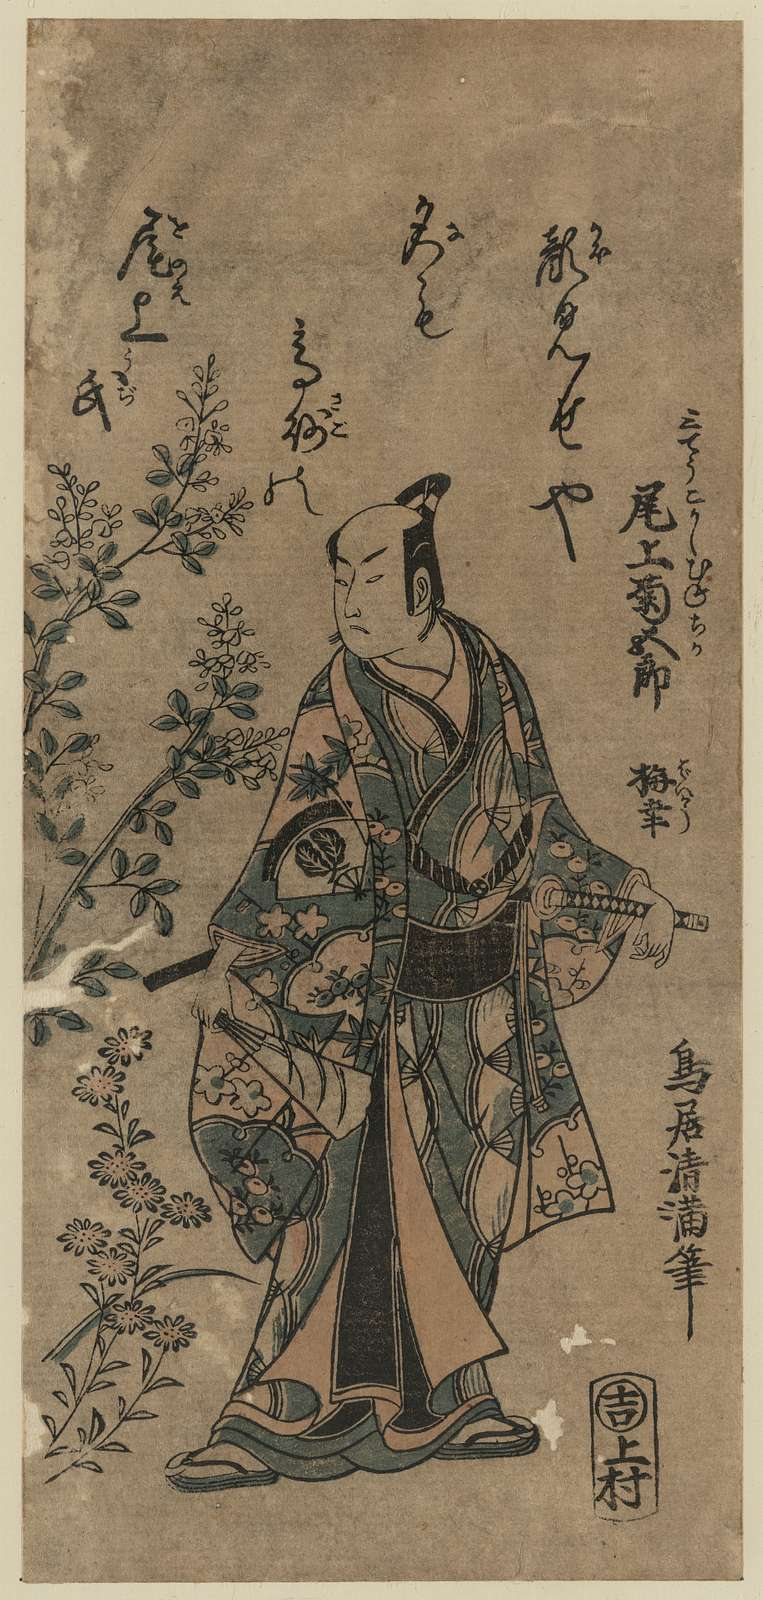 Onoe kikugorō no sanjō kokaji munechika